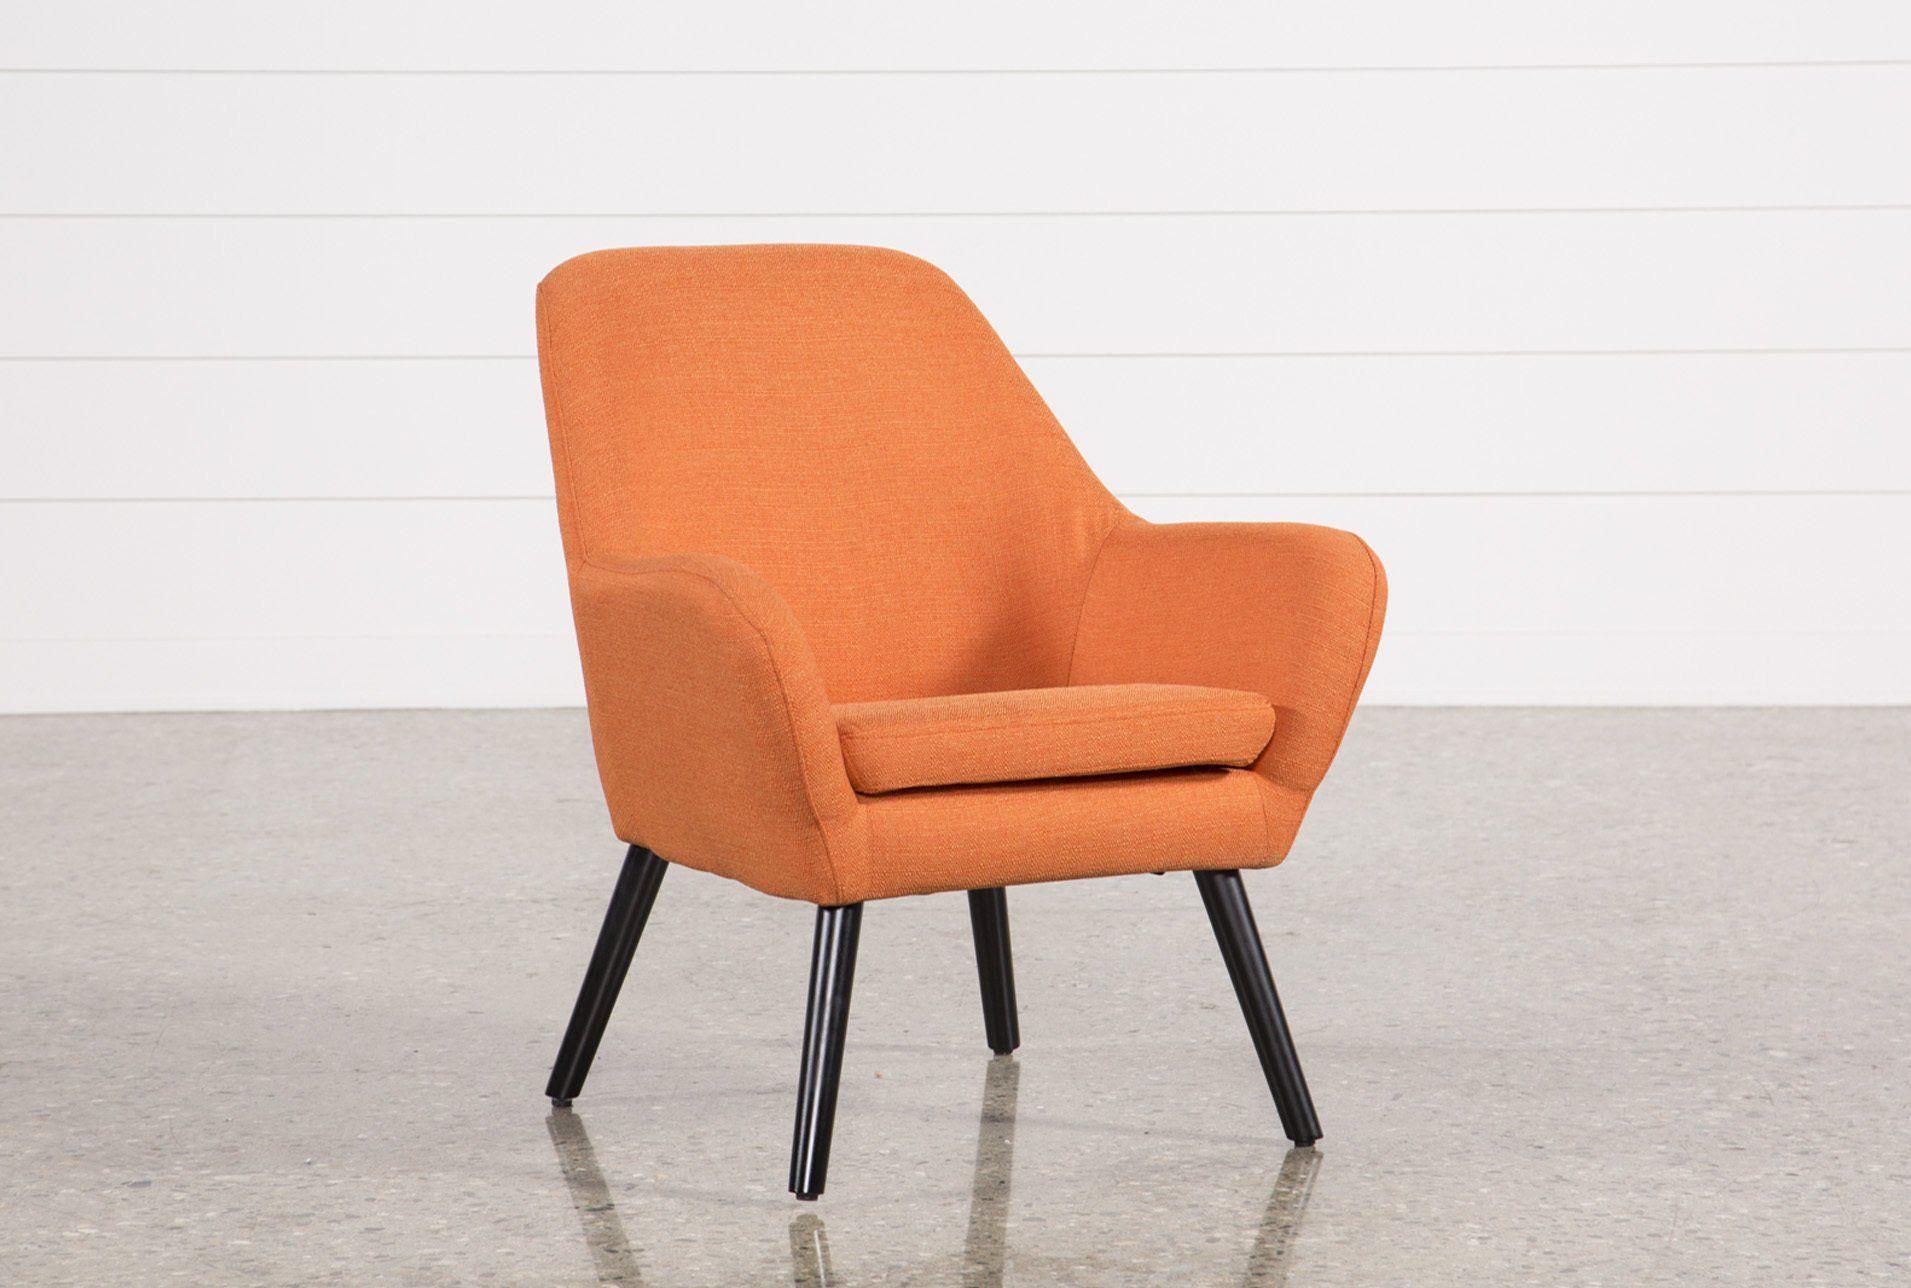 Best Mercury Mandarin Accent Chair Orange 175 Accent 400 x 300